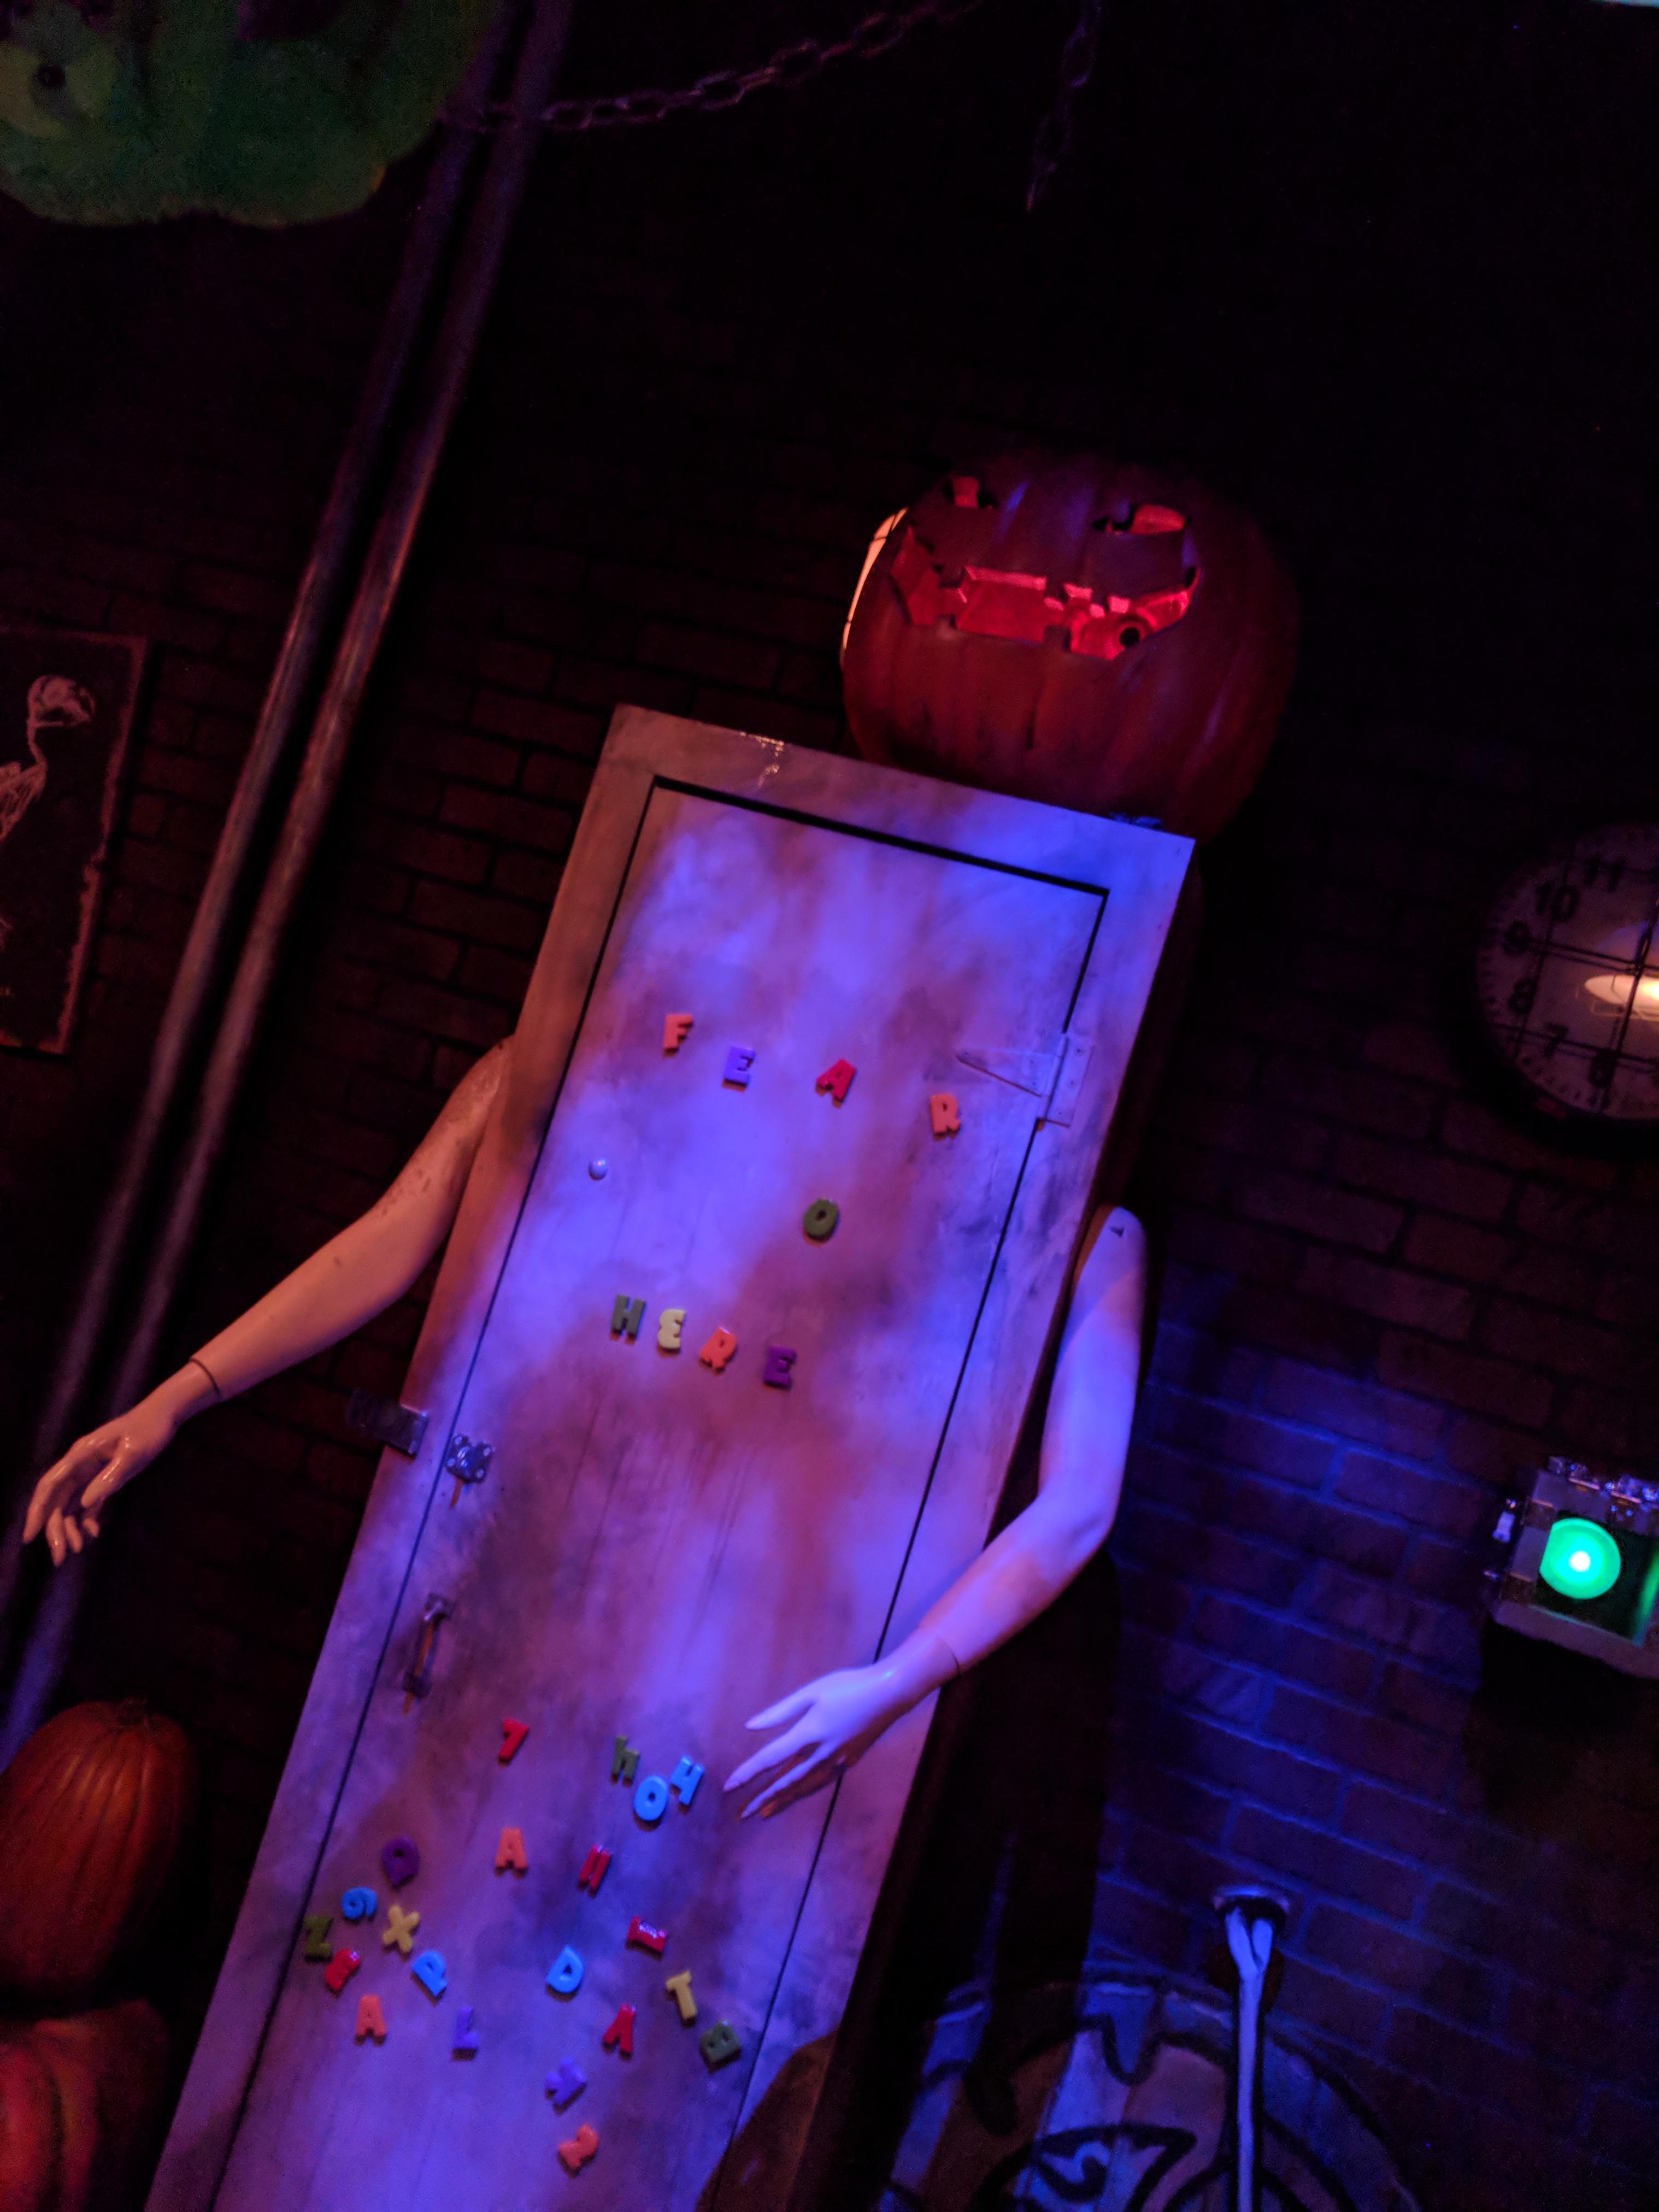 Nightmare In The Gardens Escape Room